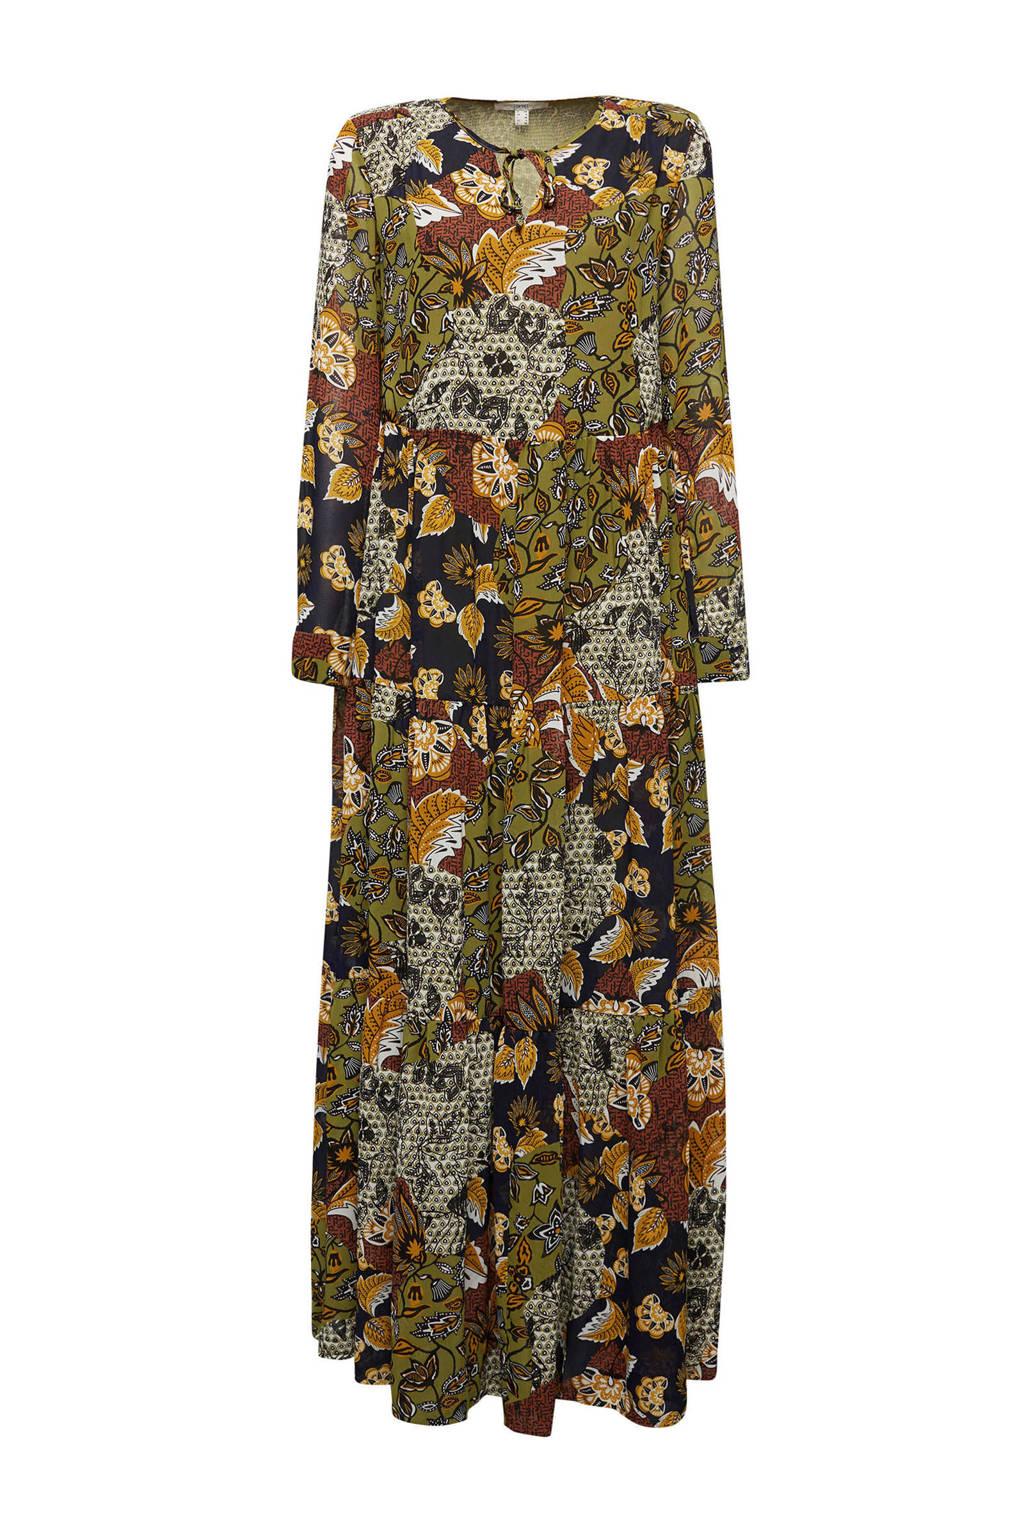 ESPRIT Women Casual semi-transparante maxi jurk met all over print en open detail olijfgroen/donkerrood/oranje, Olijfgroen/donkerrood/oranje